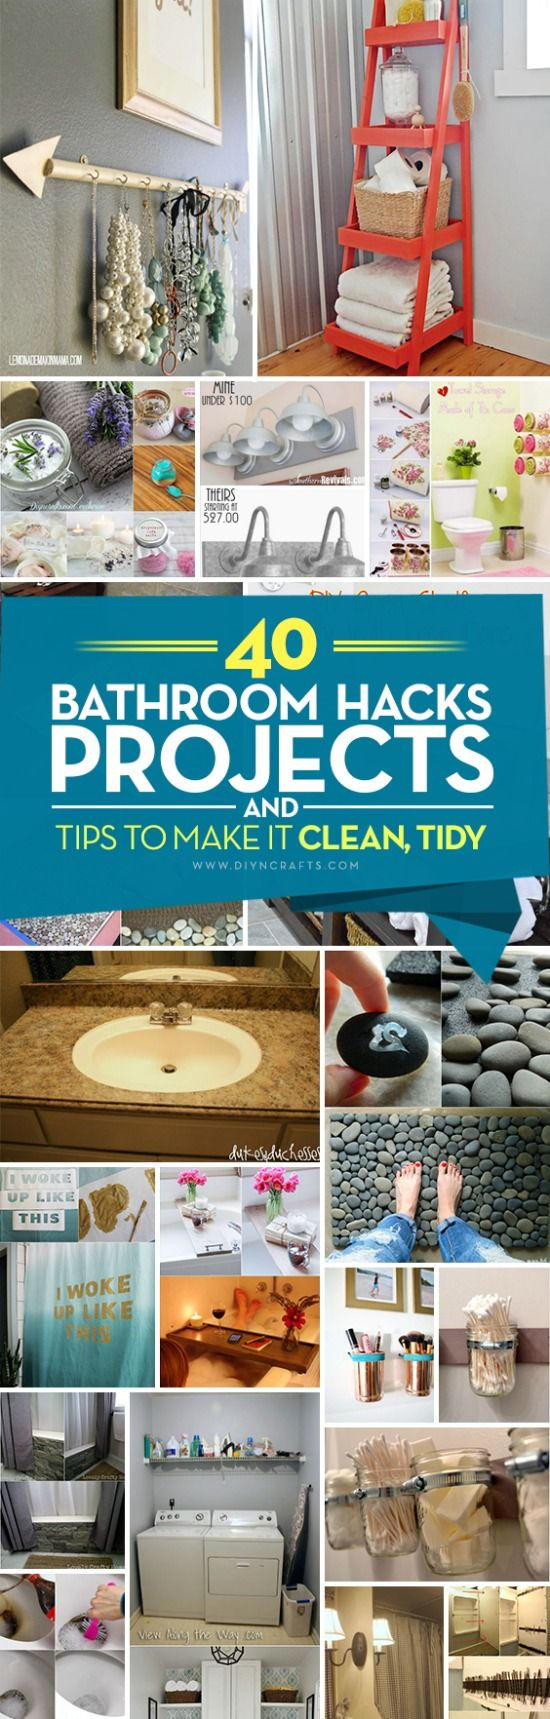 40 Bathroom Hacks Projects And Tips To Make It Clean Tidy And Stylish Bathroom Hacks Diy Bathroom Diy Bathroom Hacks